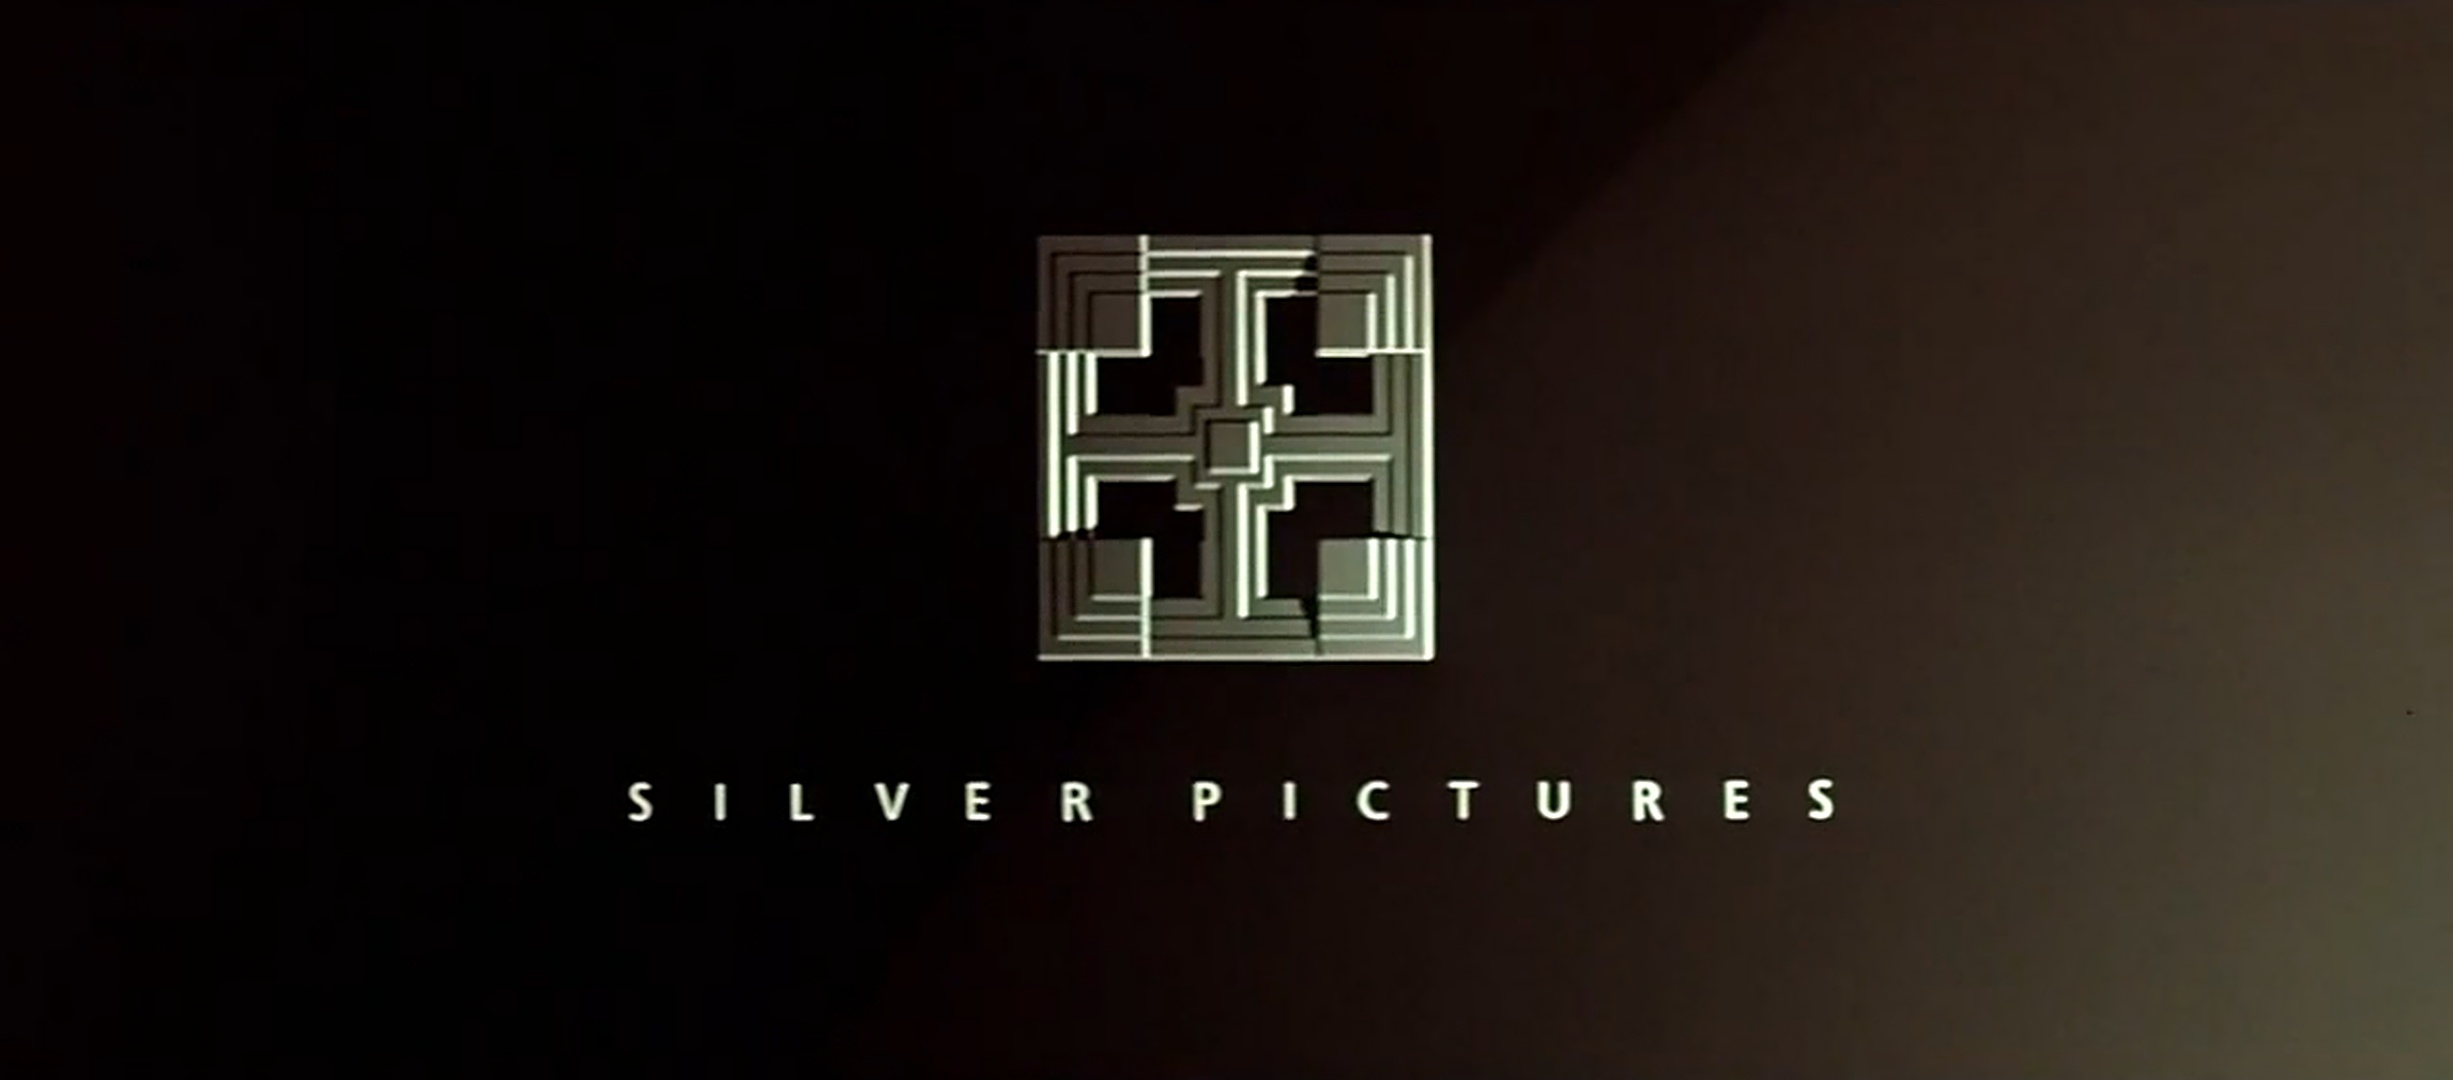 Silver pictures television logo quiz